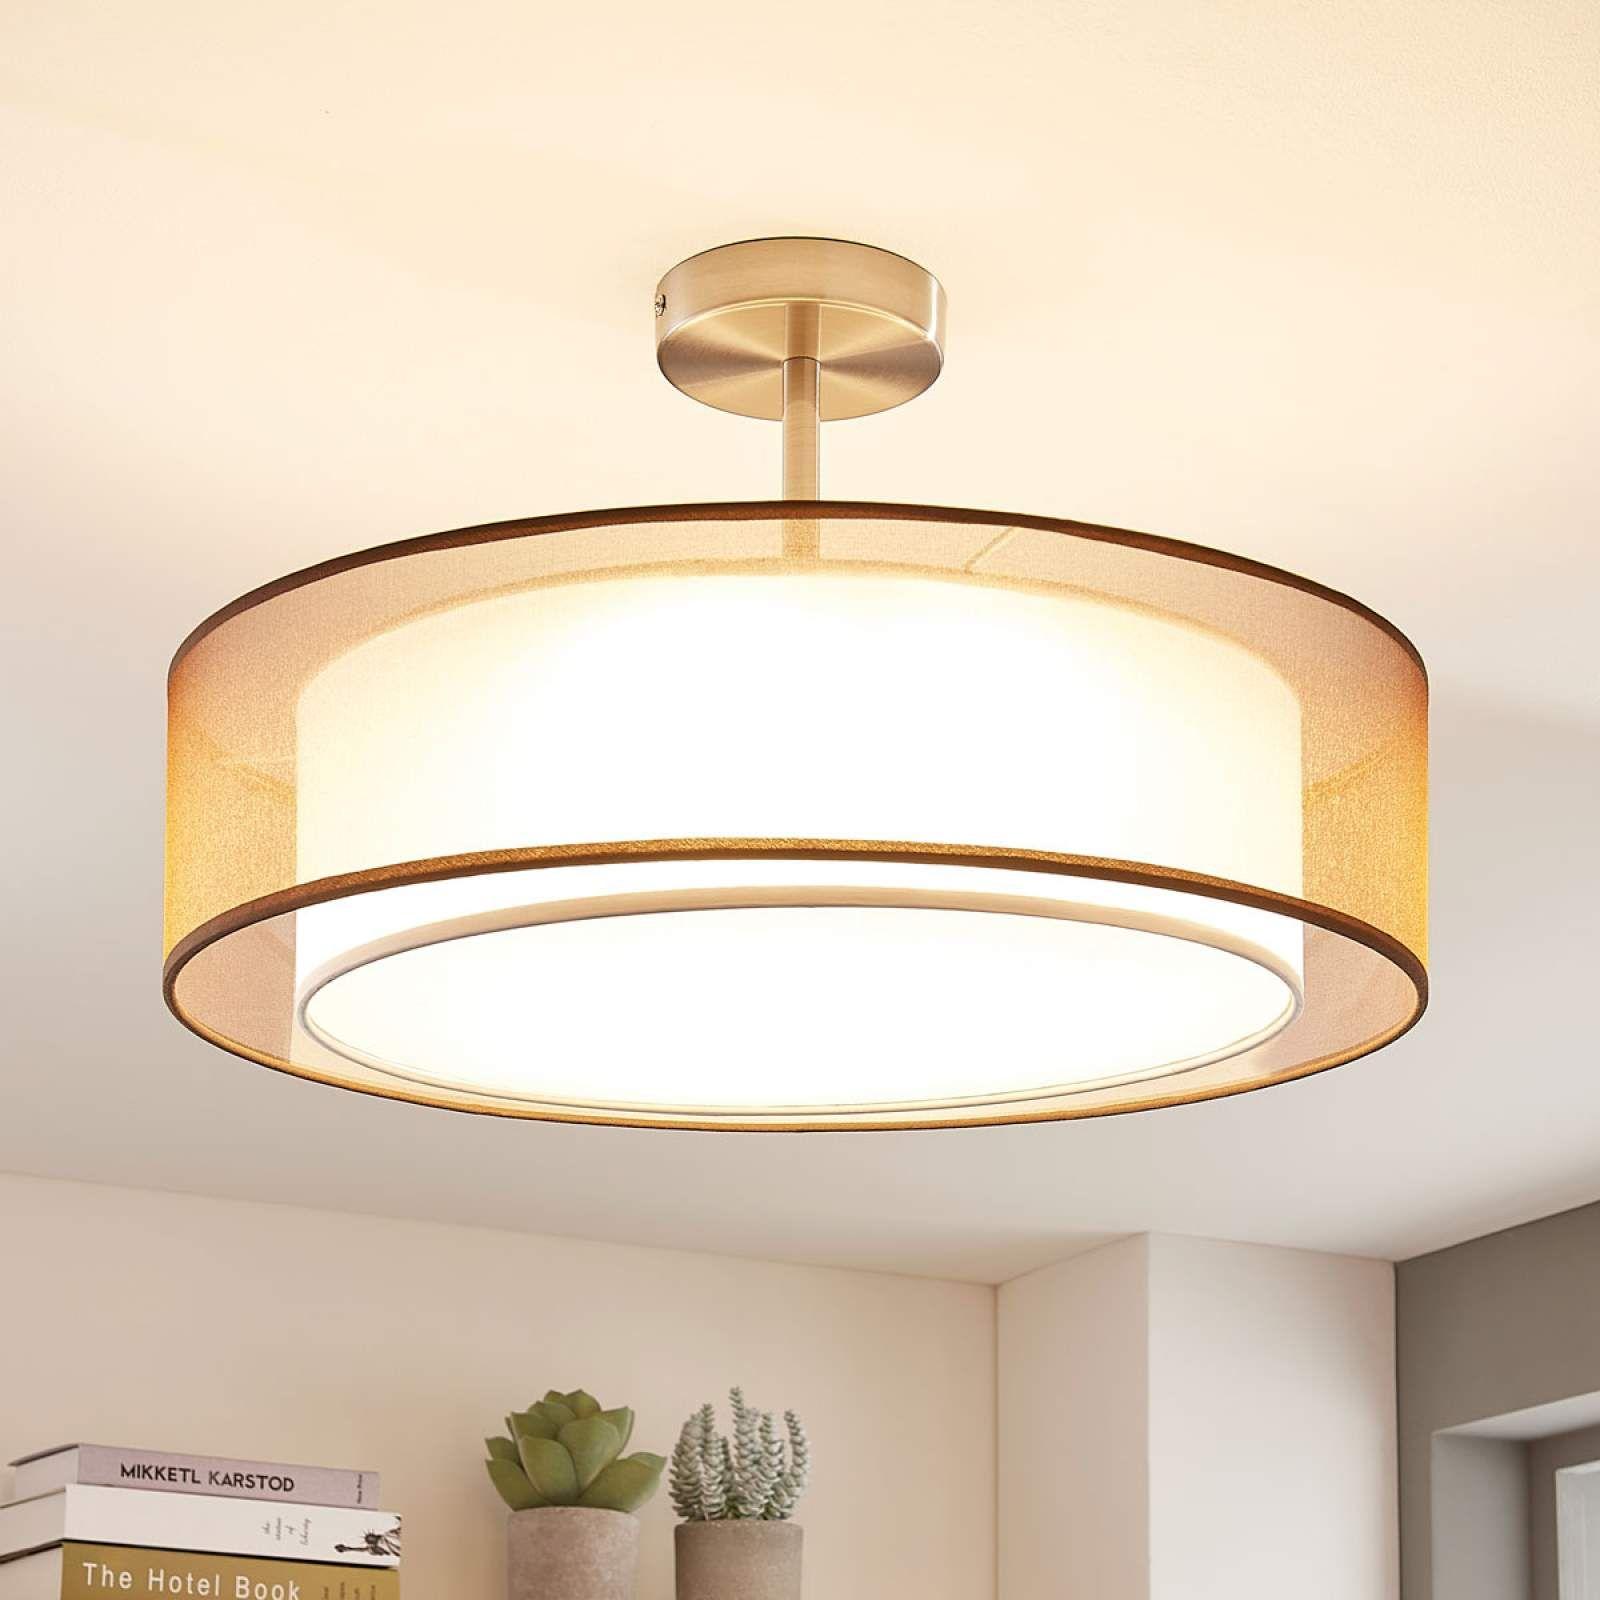 LED-Deckenlampe Pikka, 19-stufig dimmbar, braun  Led deckenlampen